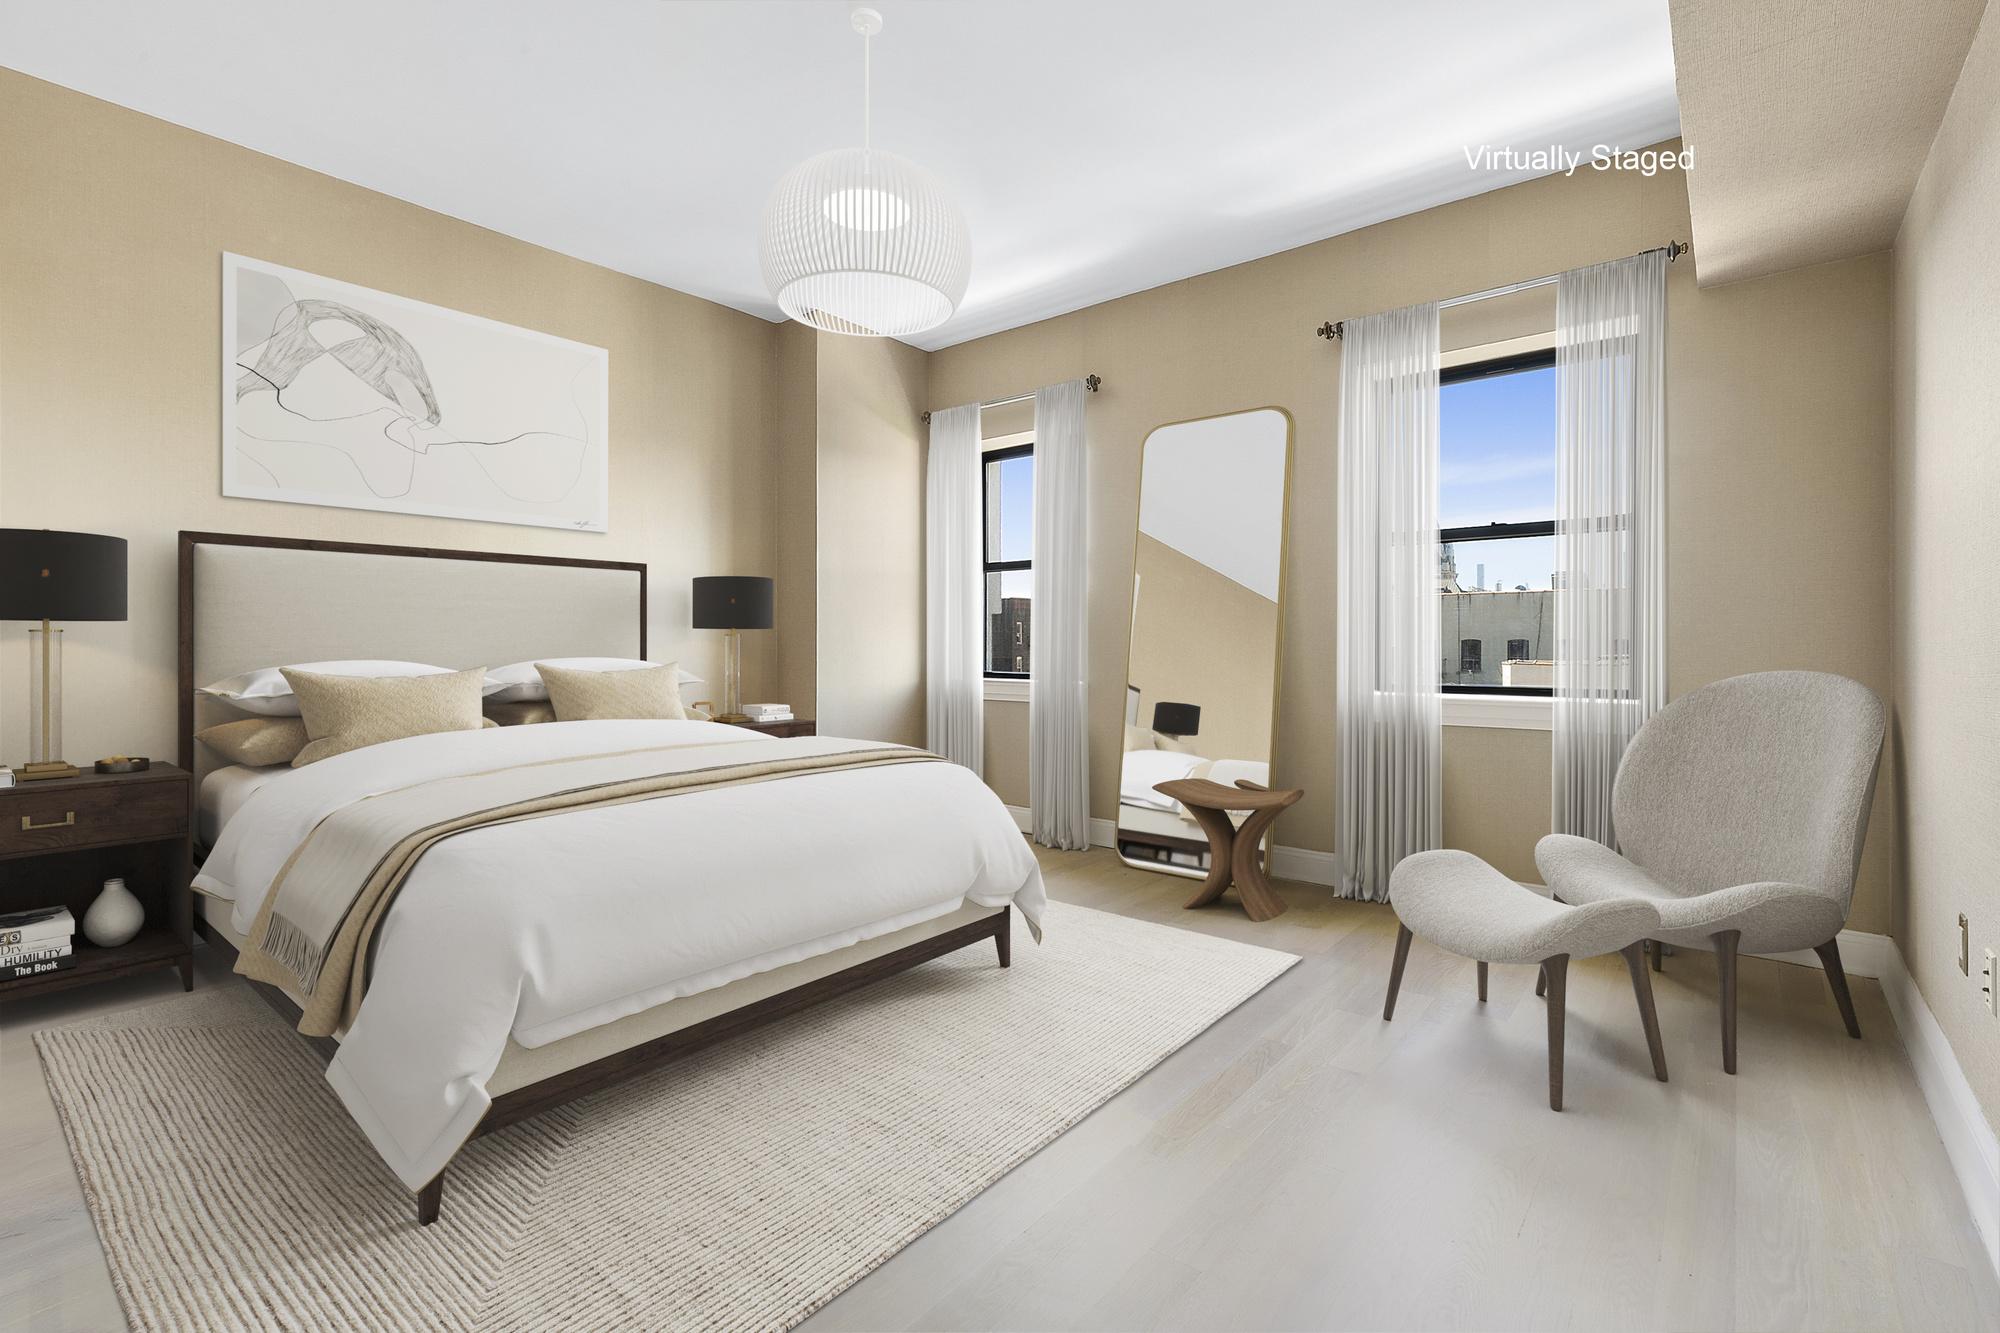 257 West 117th Street West Harlem New York NY 10026